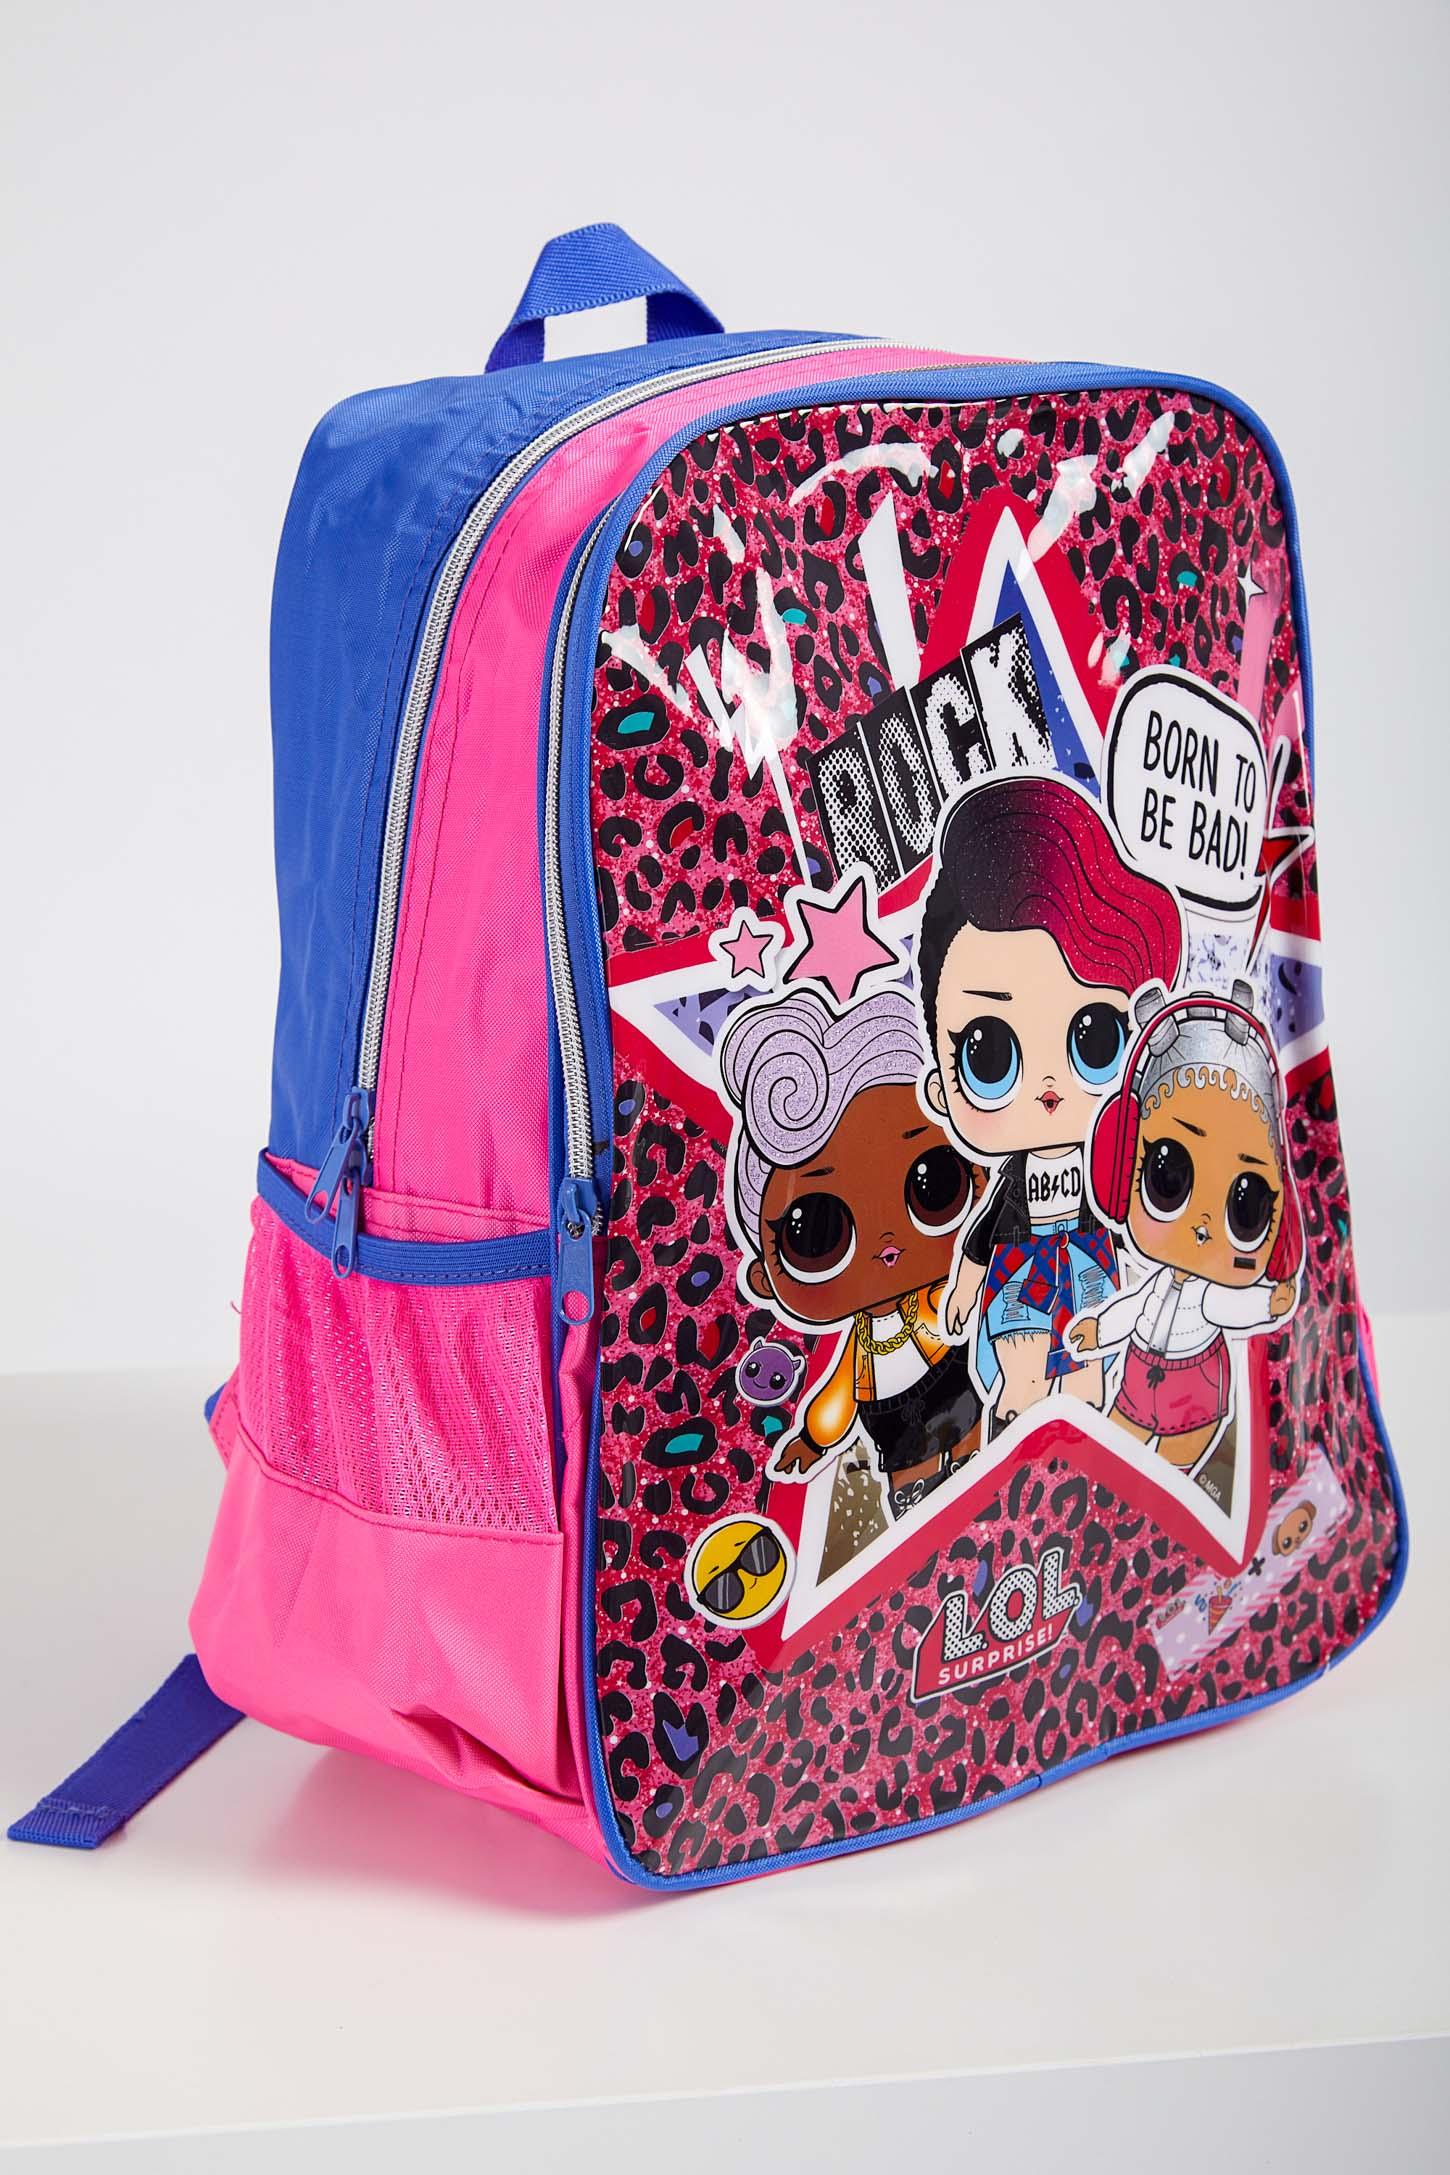 Mochila-Escolar-Infantil-Menina-Lol-Luxcel-Pink